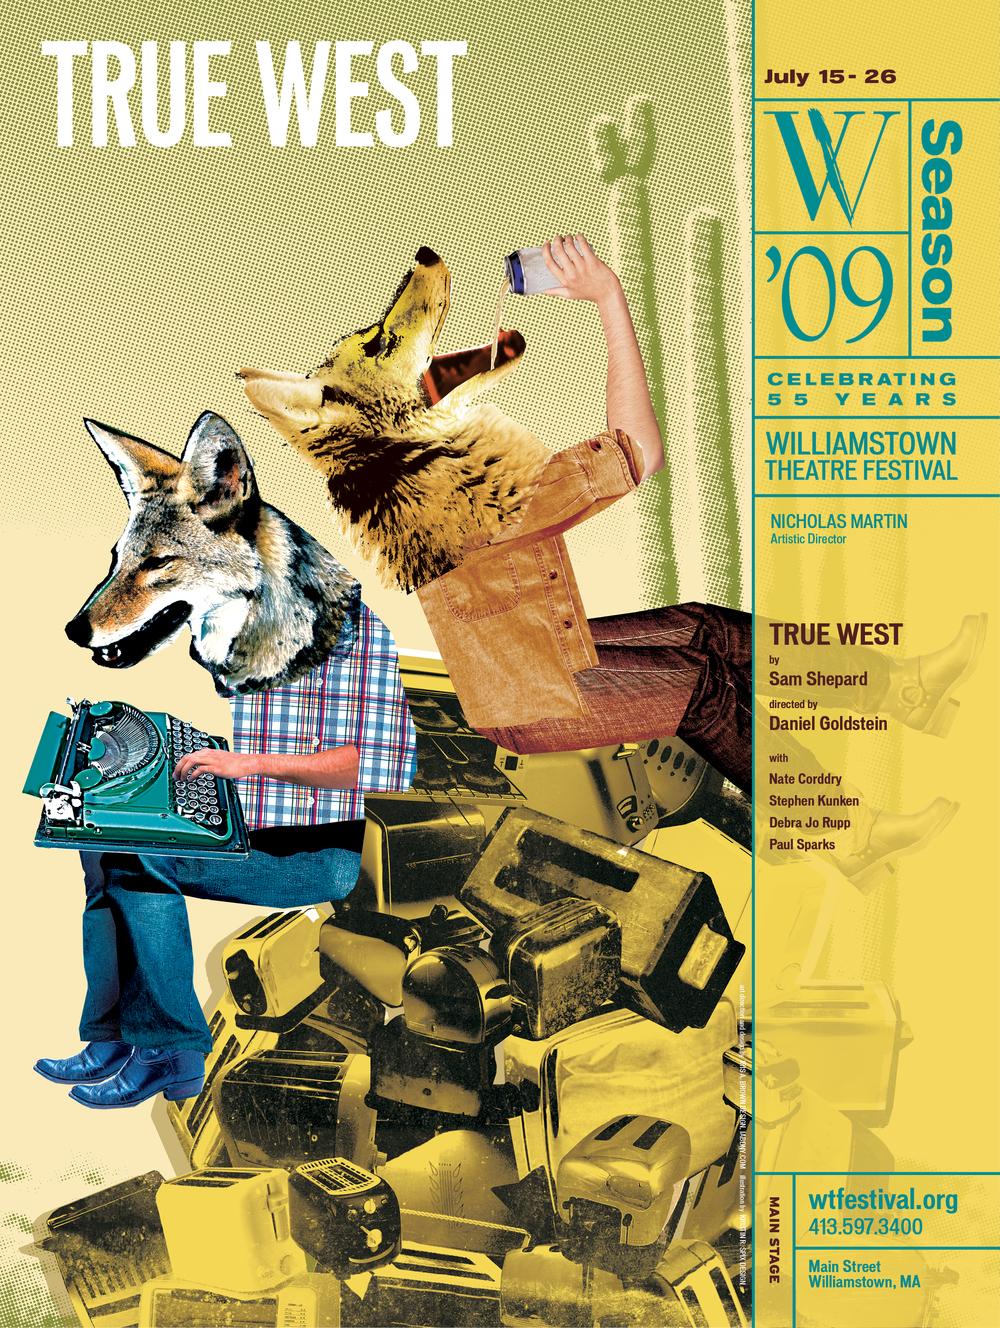 Poster_WTF_2009_TrueWest.jpg